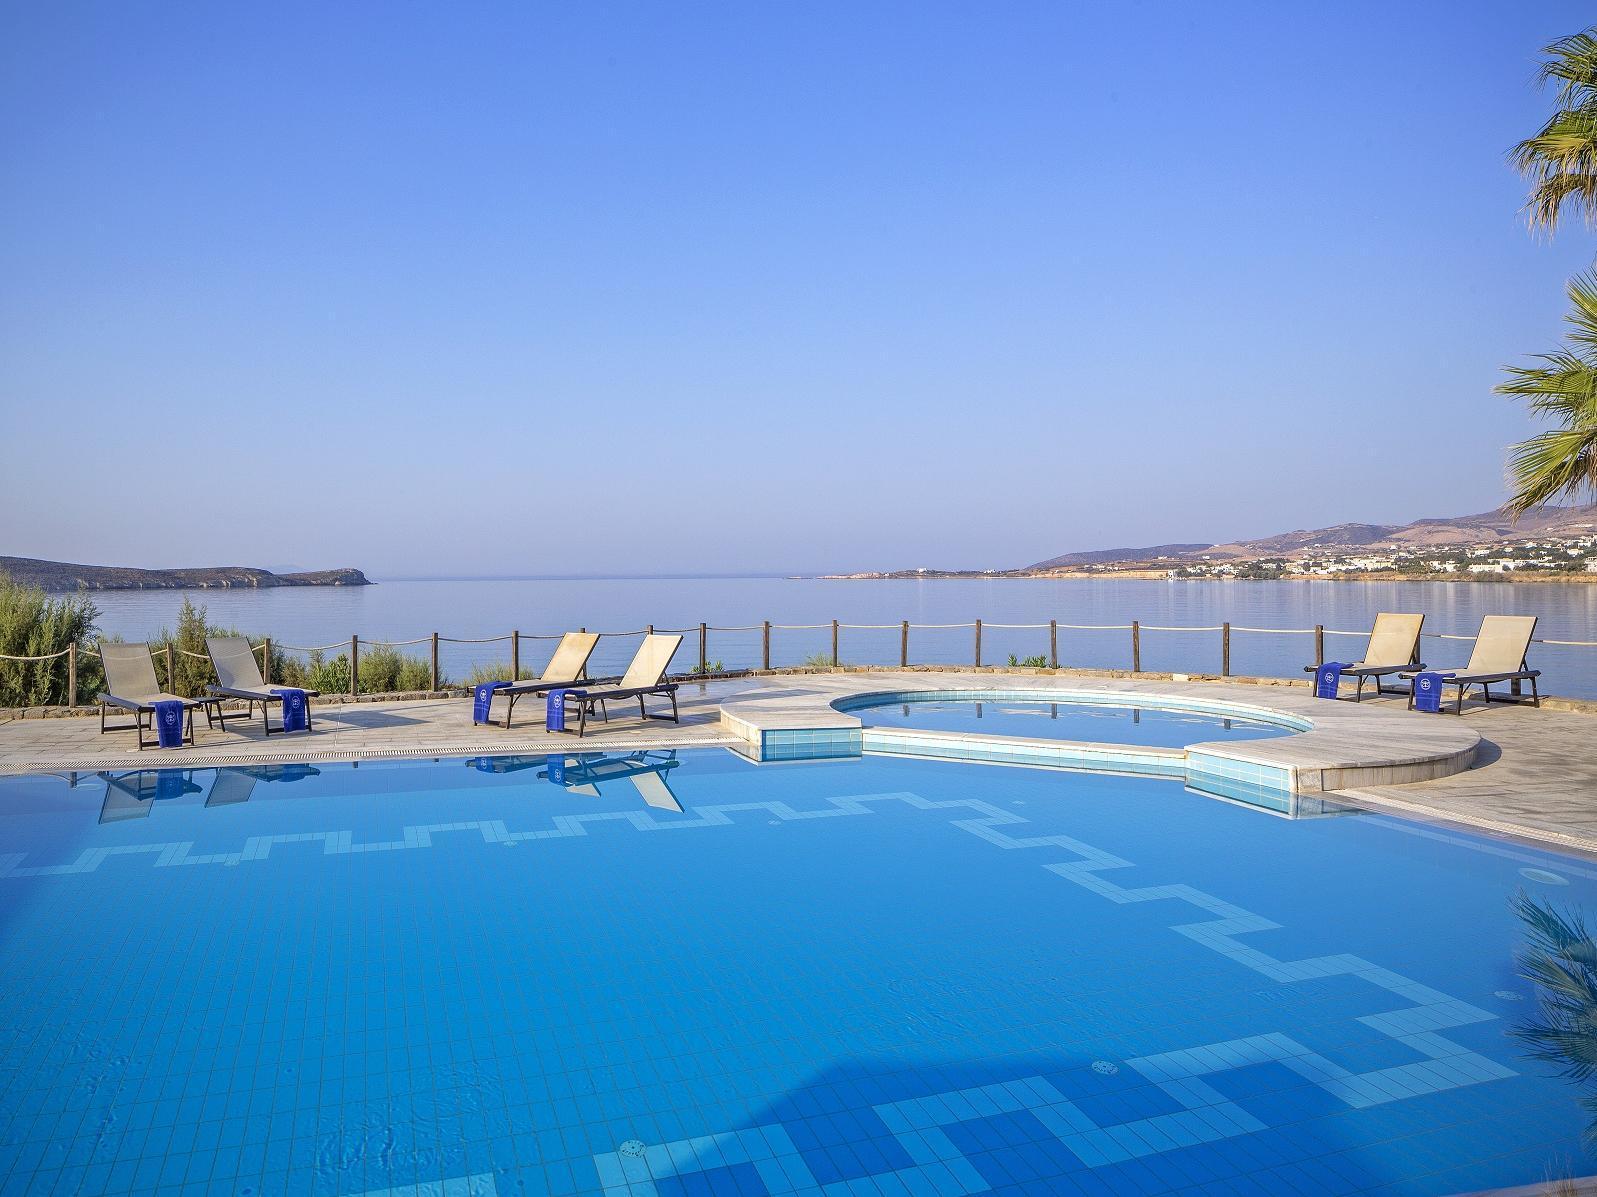 Poseidon Of Paros Hotel And Spa